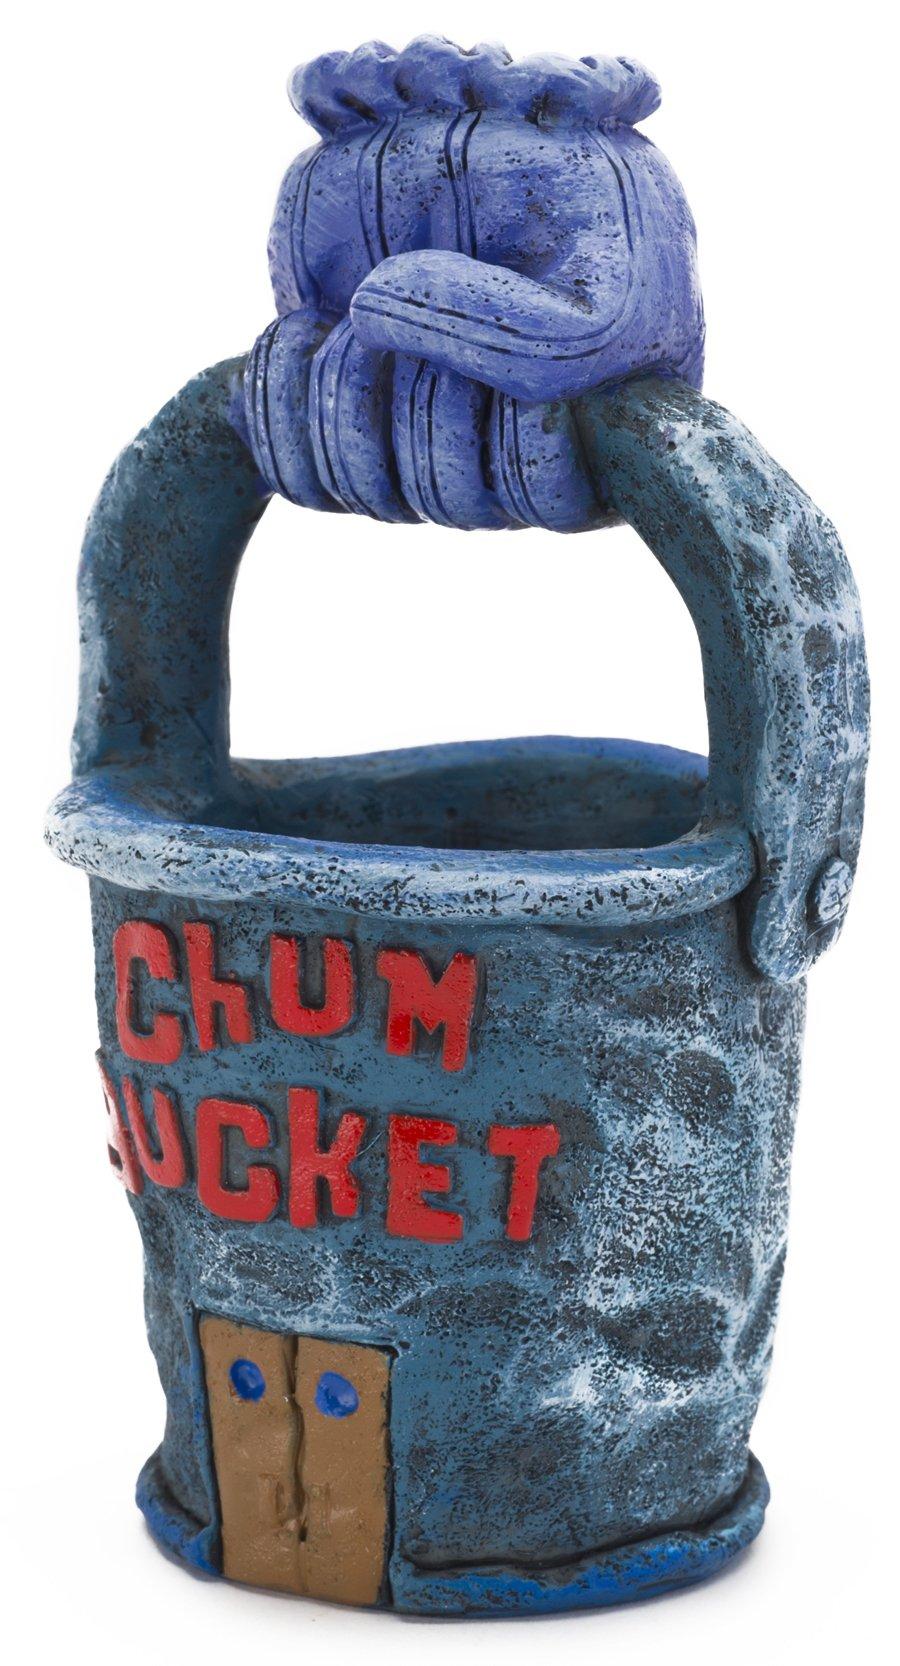 Nickelodeon Spongebob Squarepants Chum Bucket Aquarium Ornament, 4.25 by 2-1/2 by 2-1/4-Inch